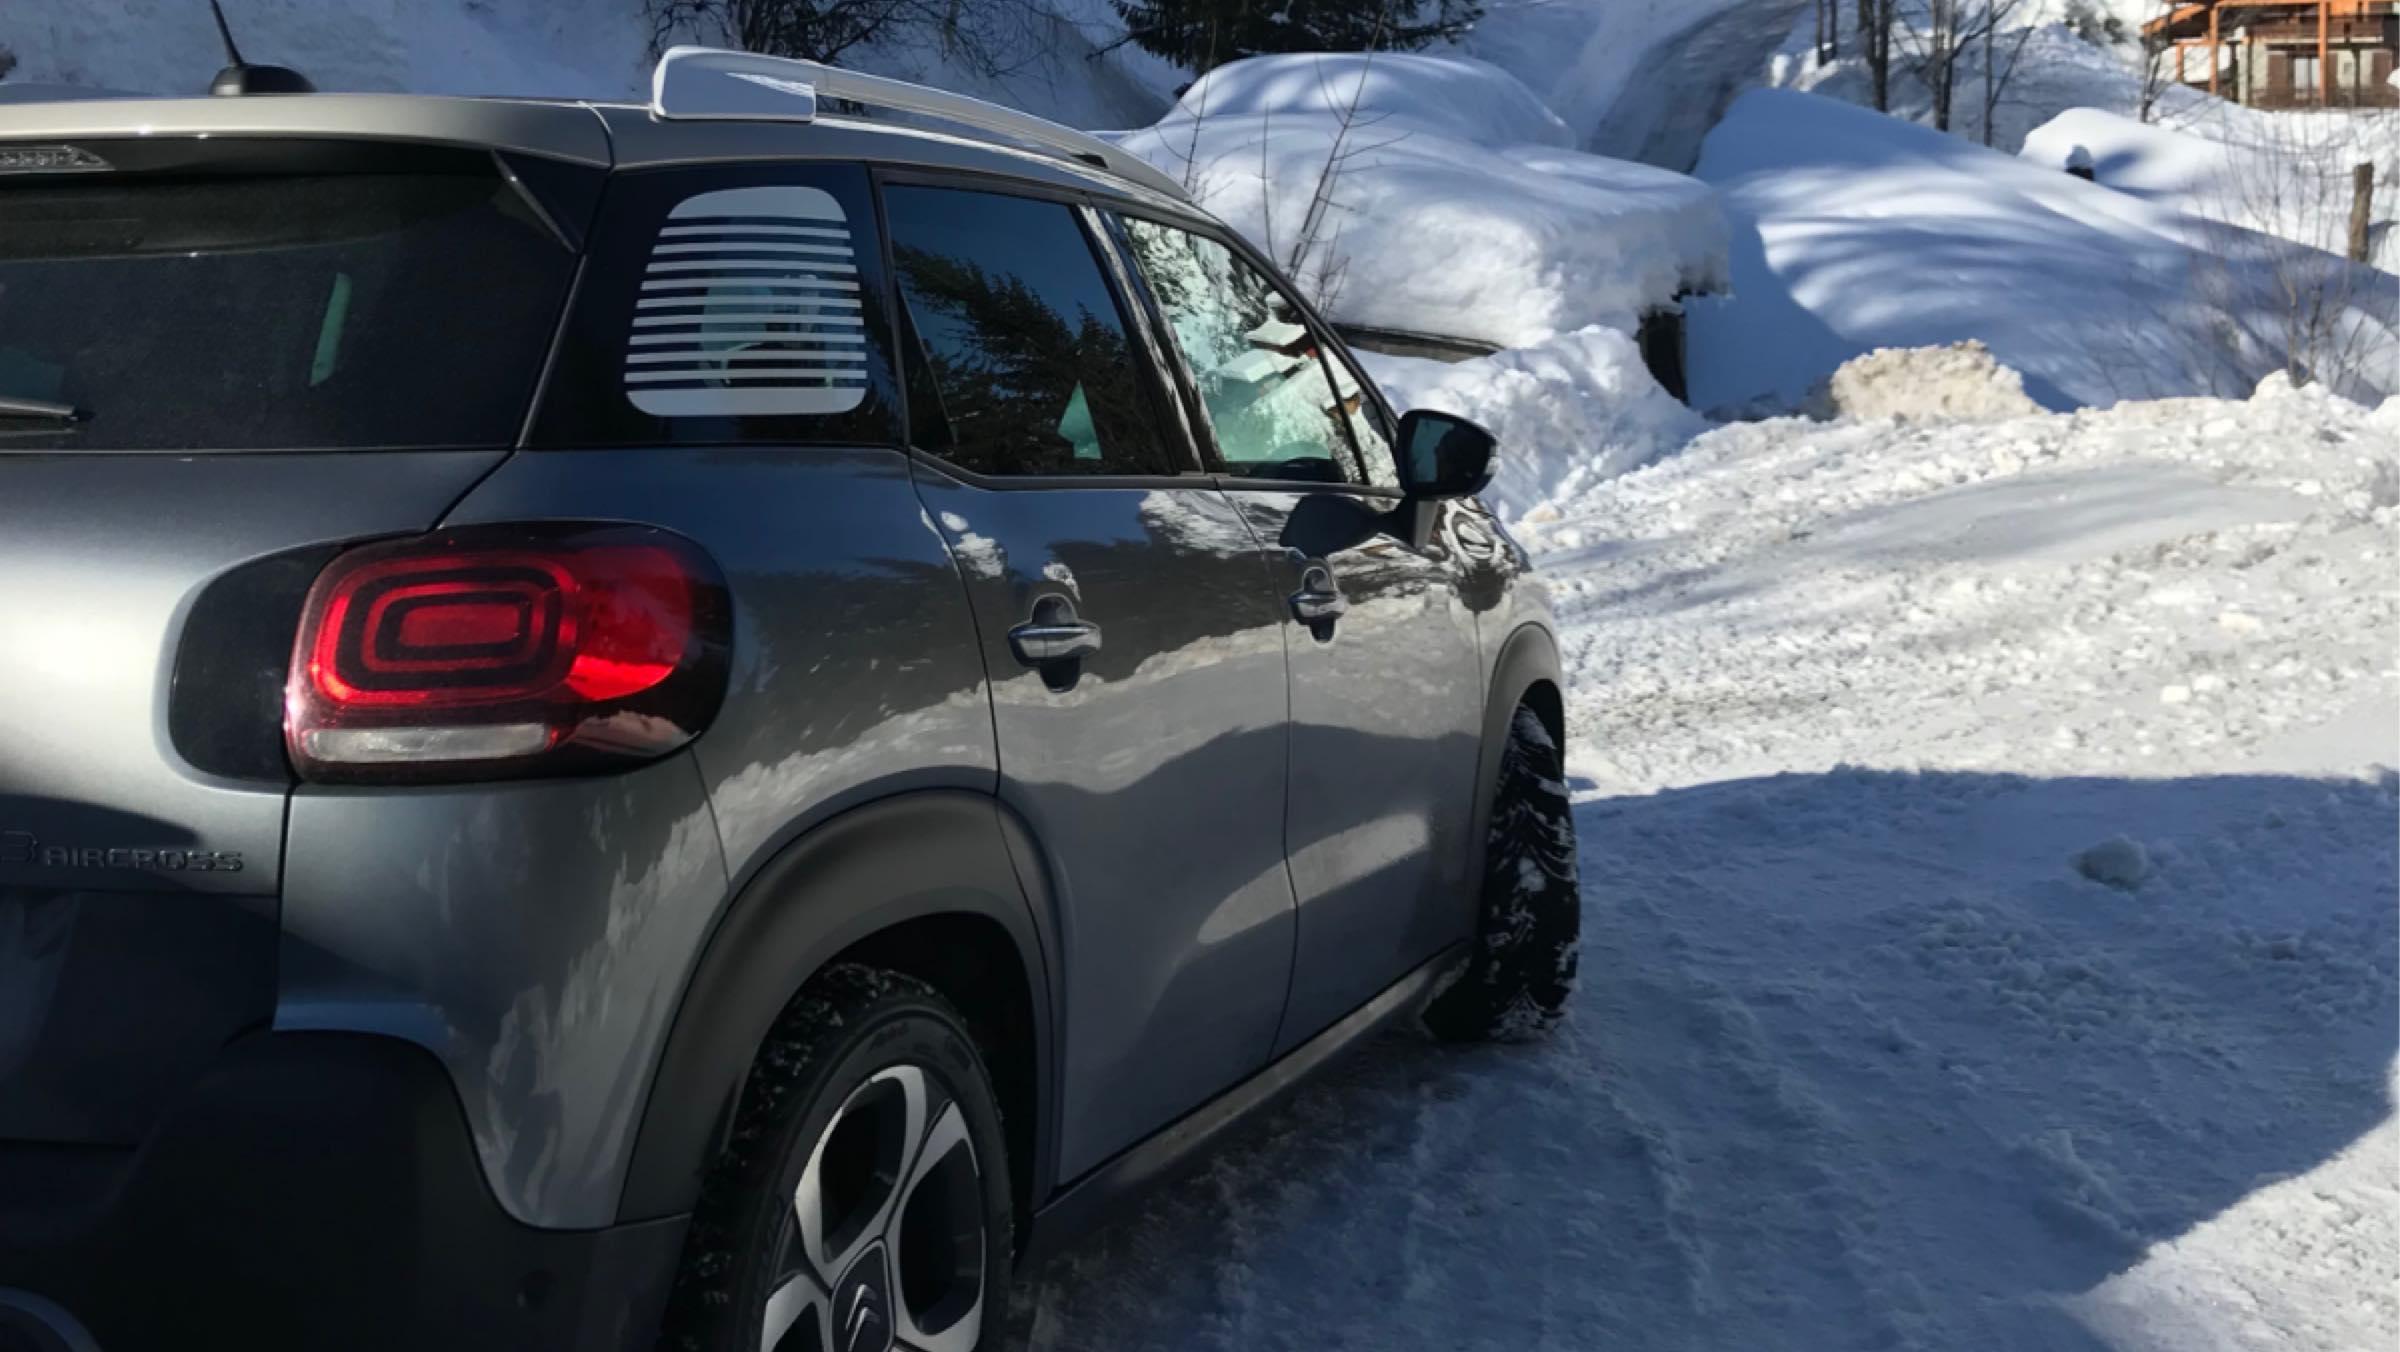 Neumáticos nieve Citroën C3 Aircross